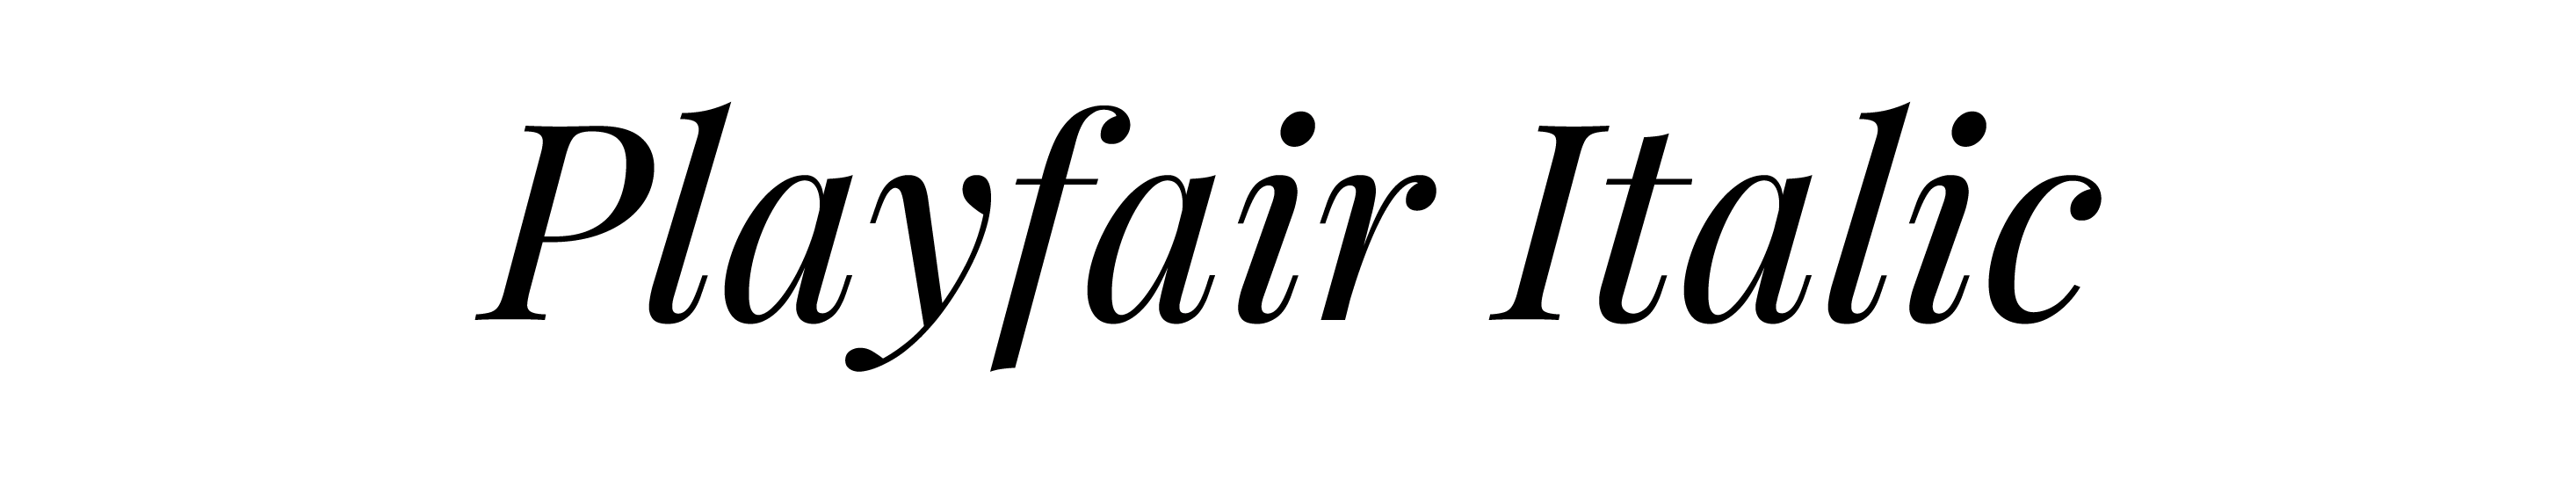 Playfair Italic